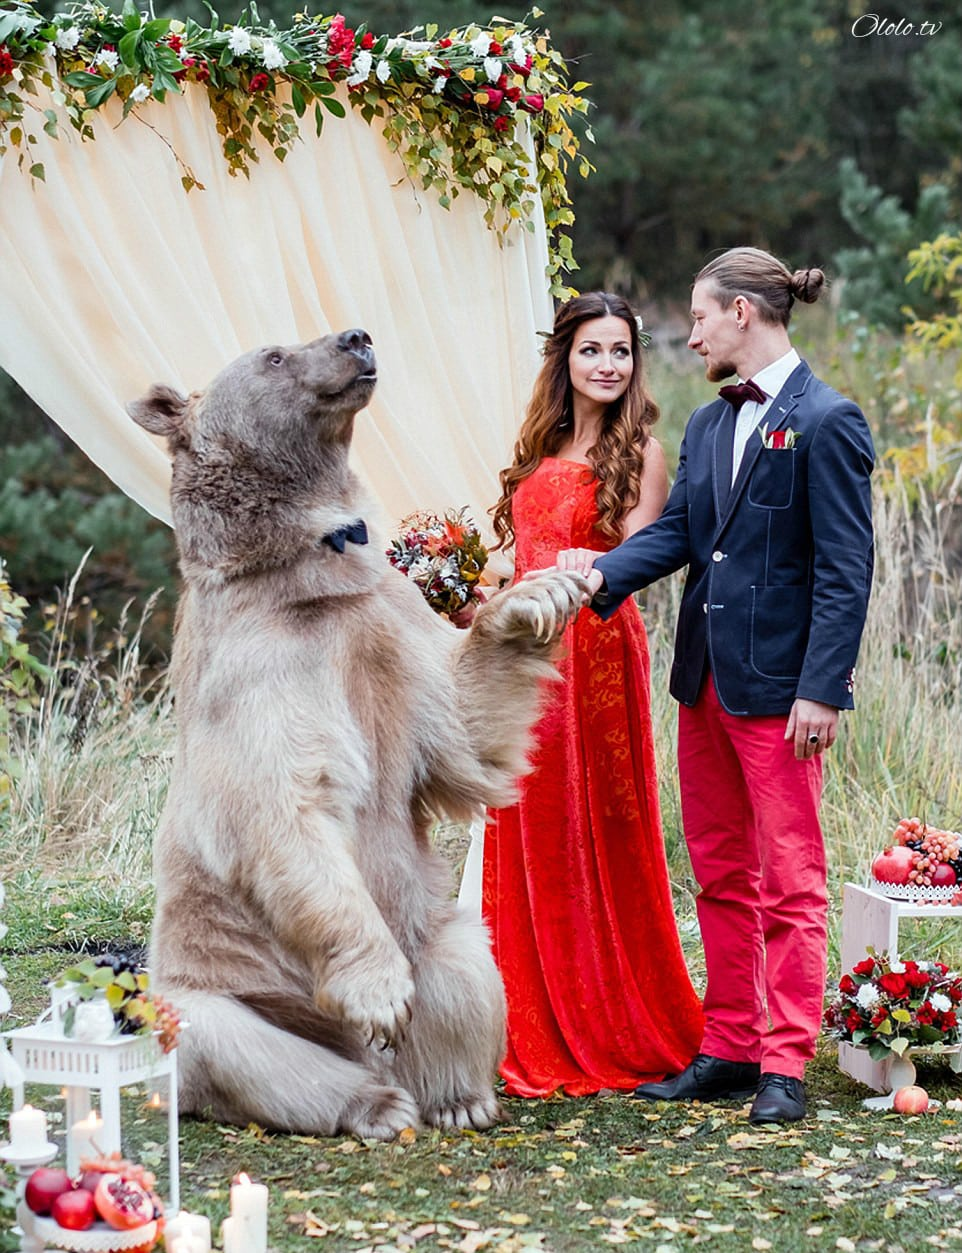 Фото зверей на свадьбе